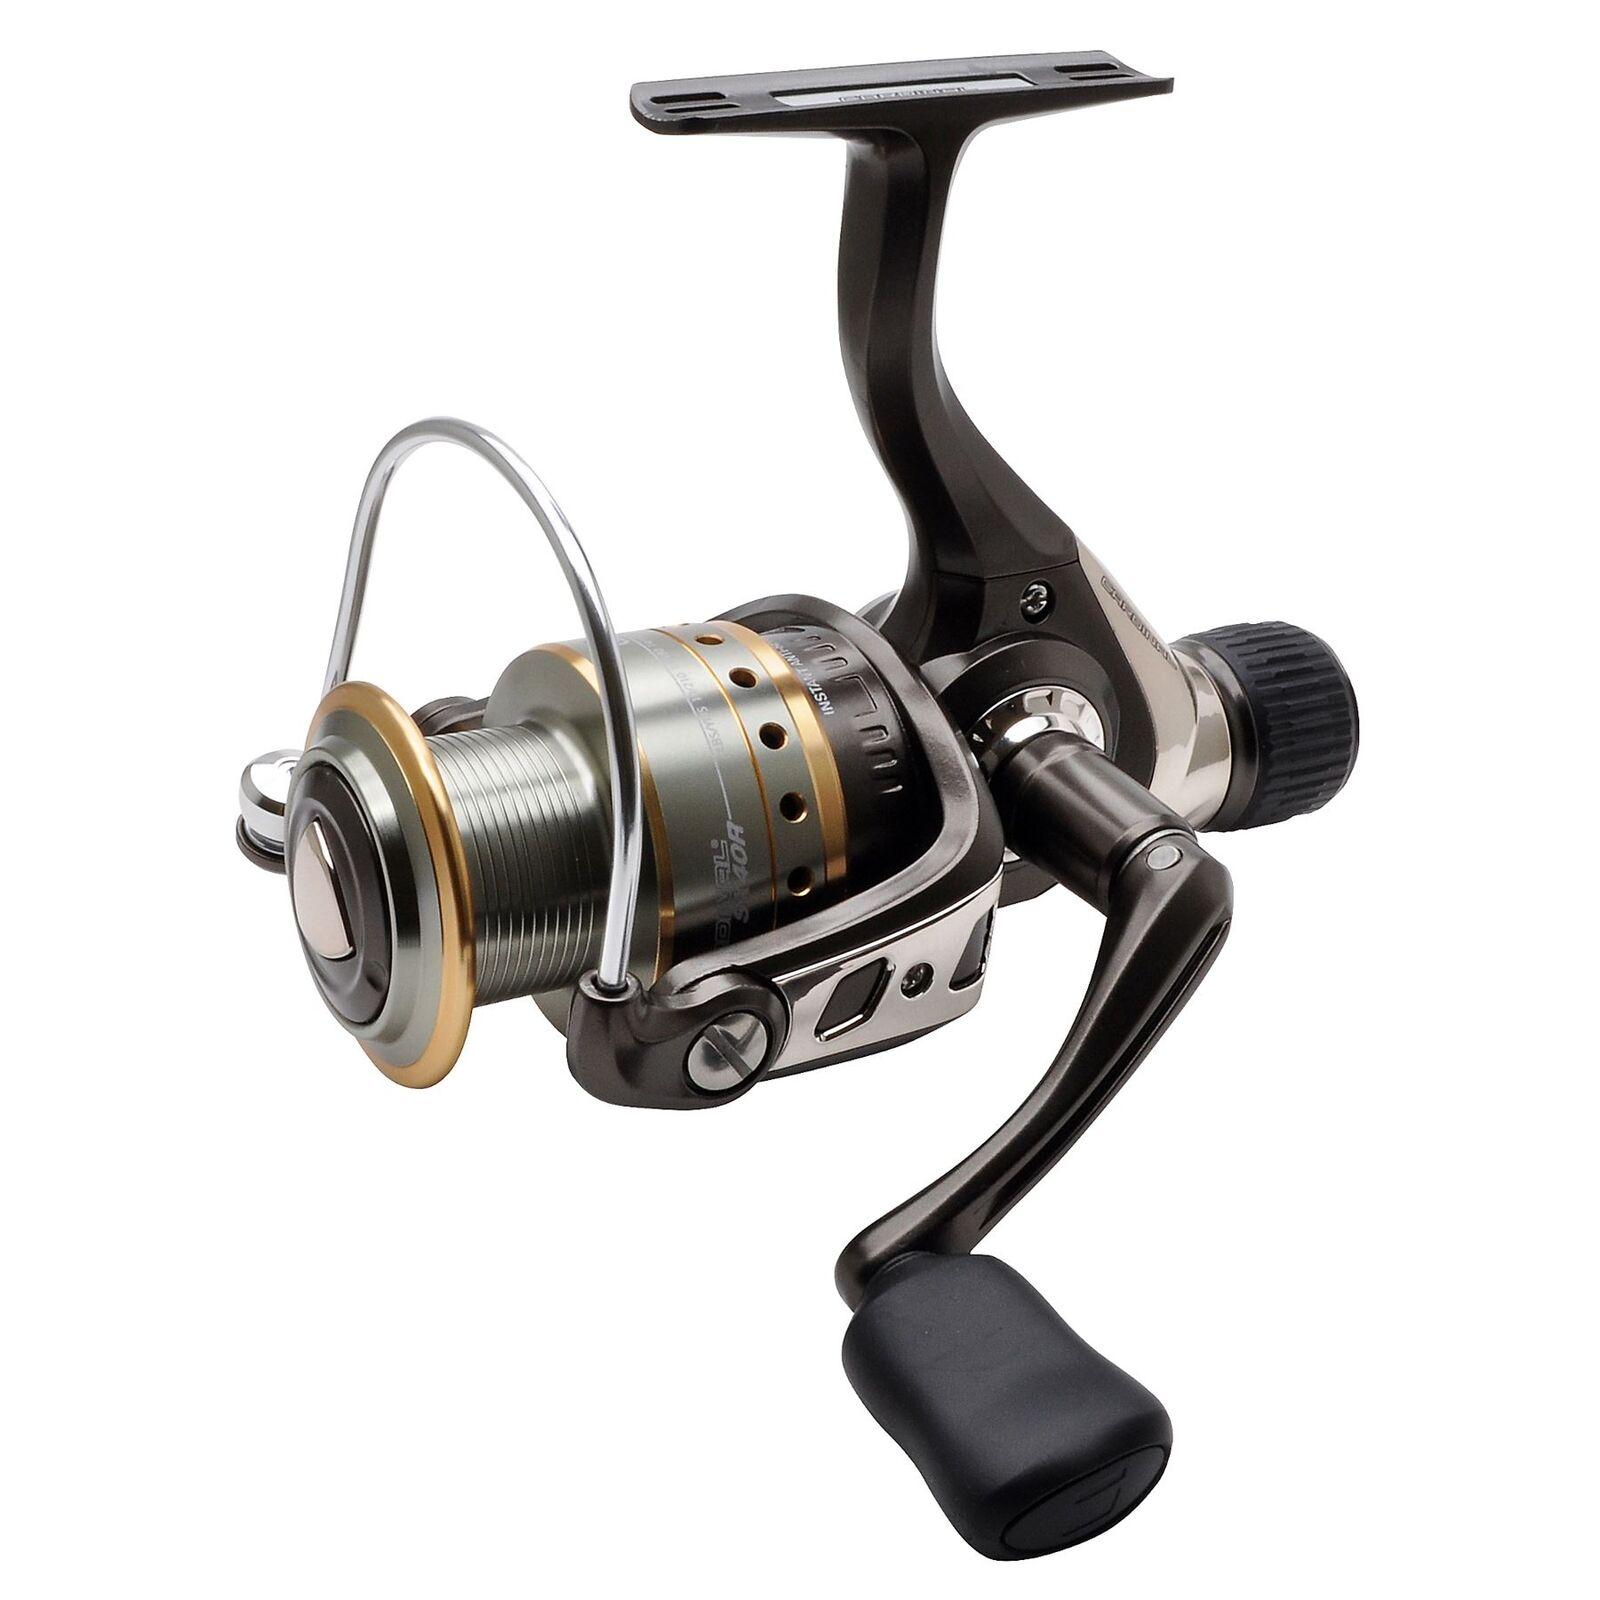 Abu Garcia Cardinal SX 30 30 30 RD / Spinning Fishing Reel bfd92a